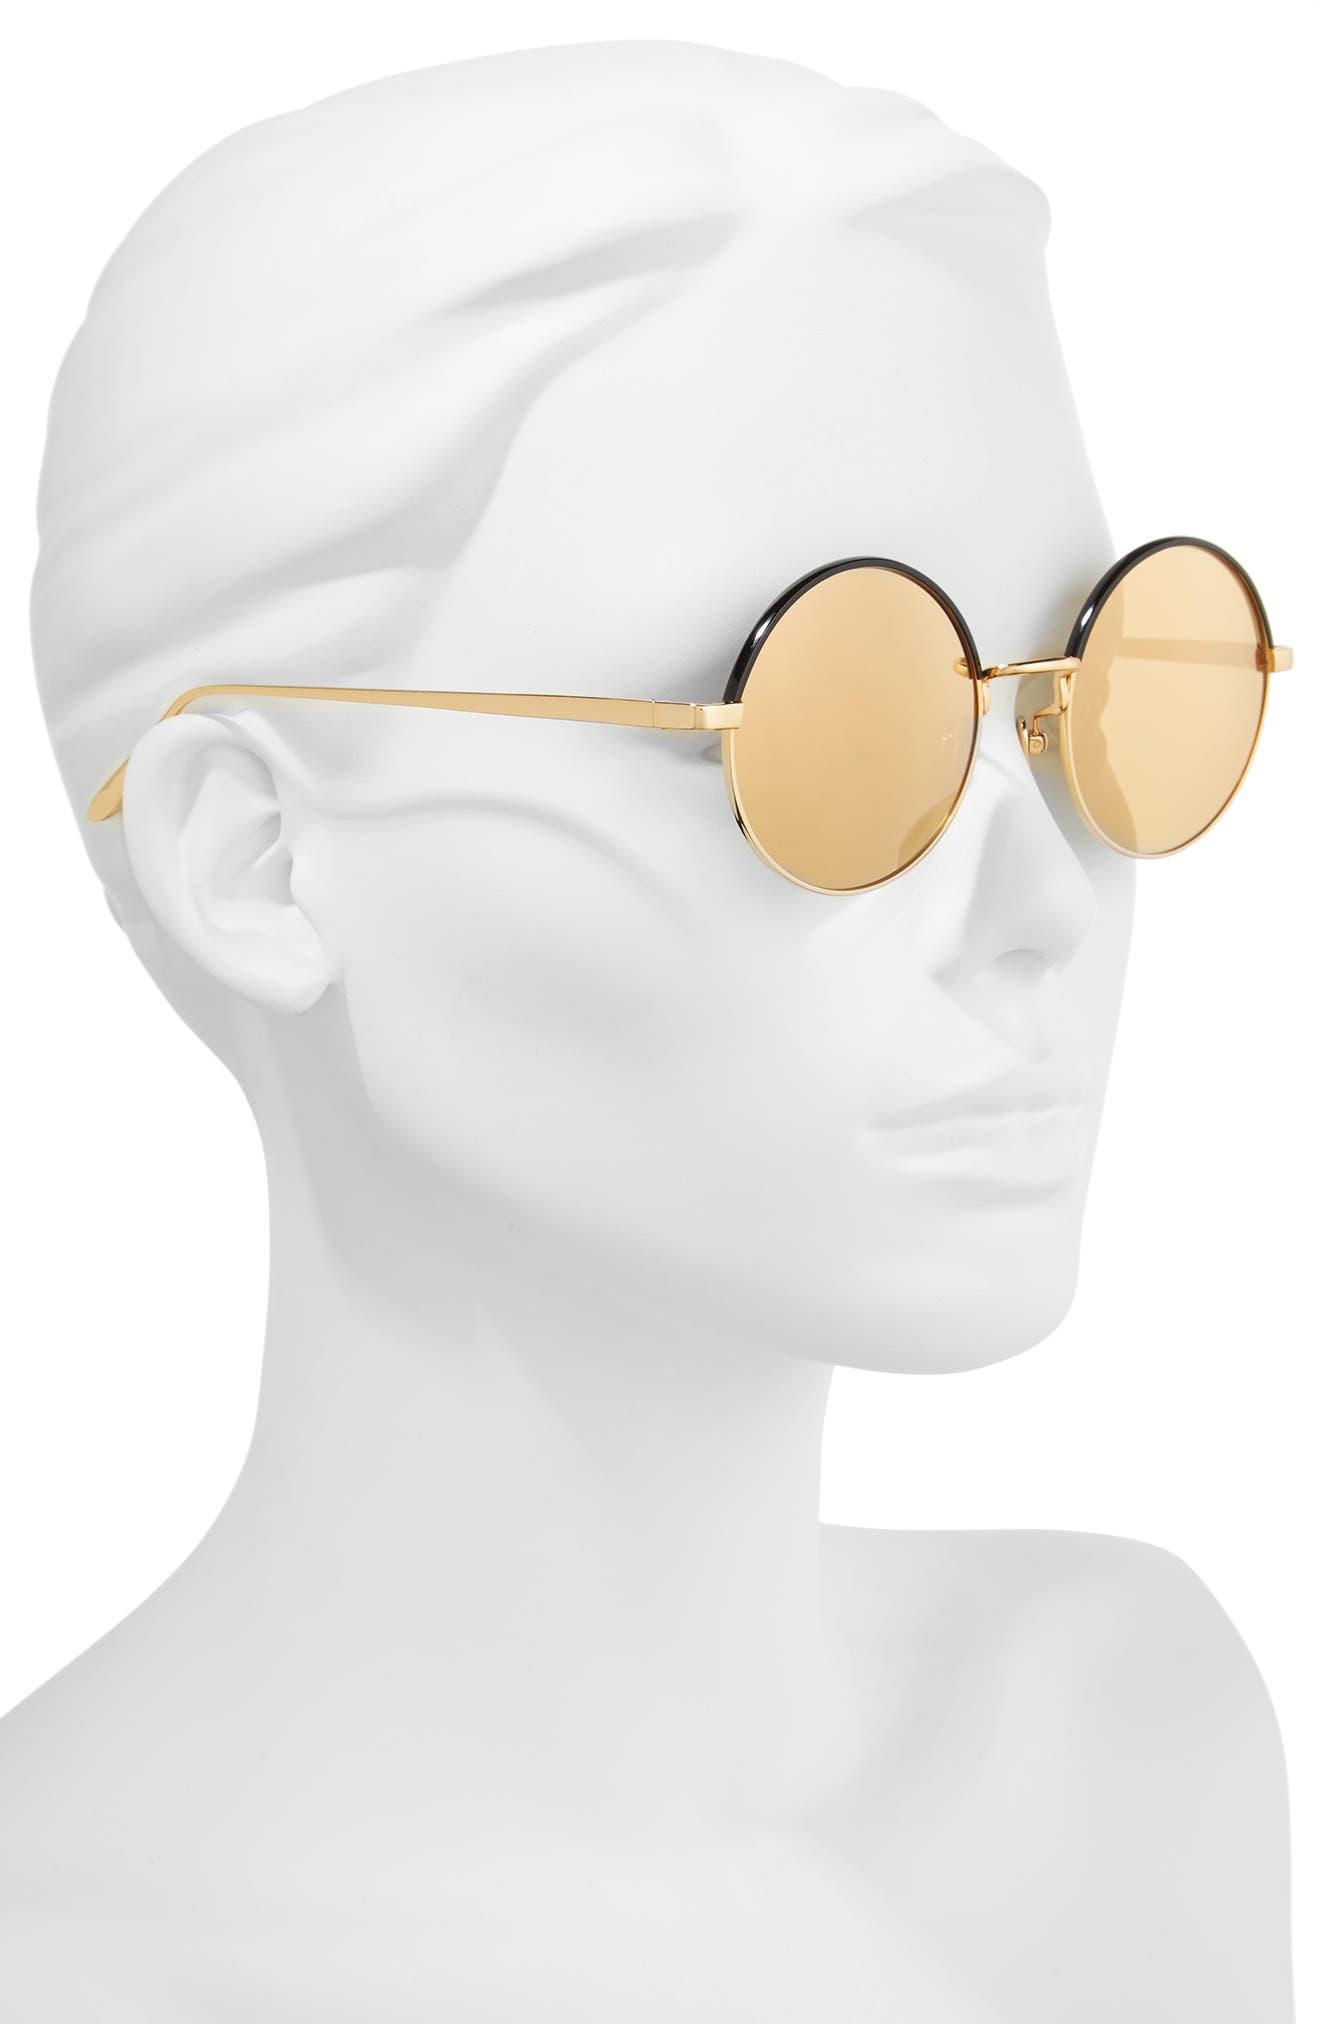 51mm Mirrored 18 Karat Gold Trim Round Sunglasses,                             Alternate thumbnail 2, color,                             710